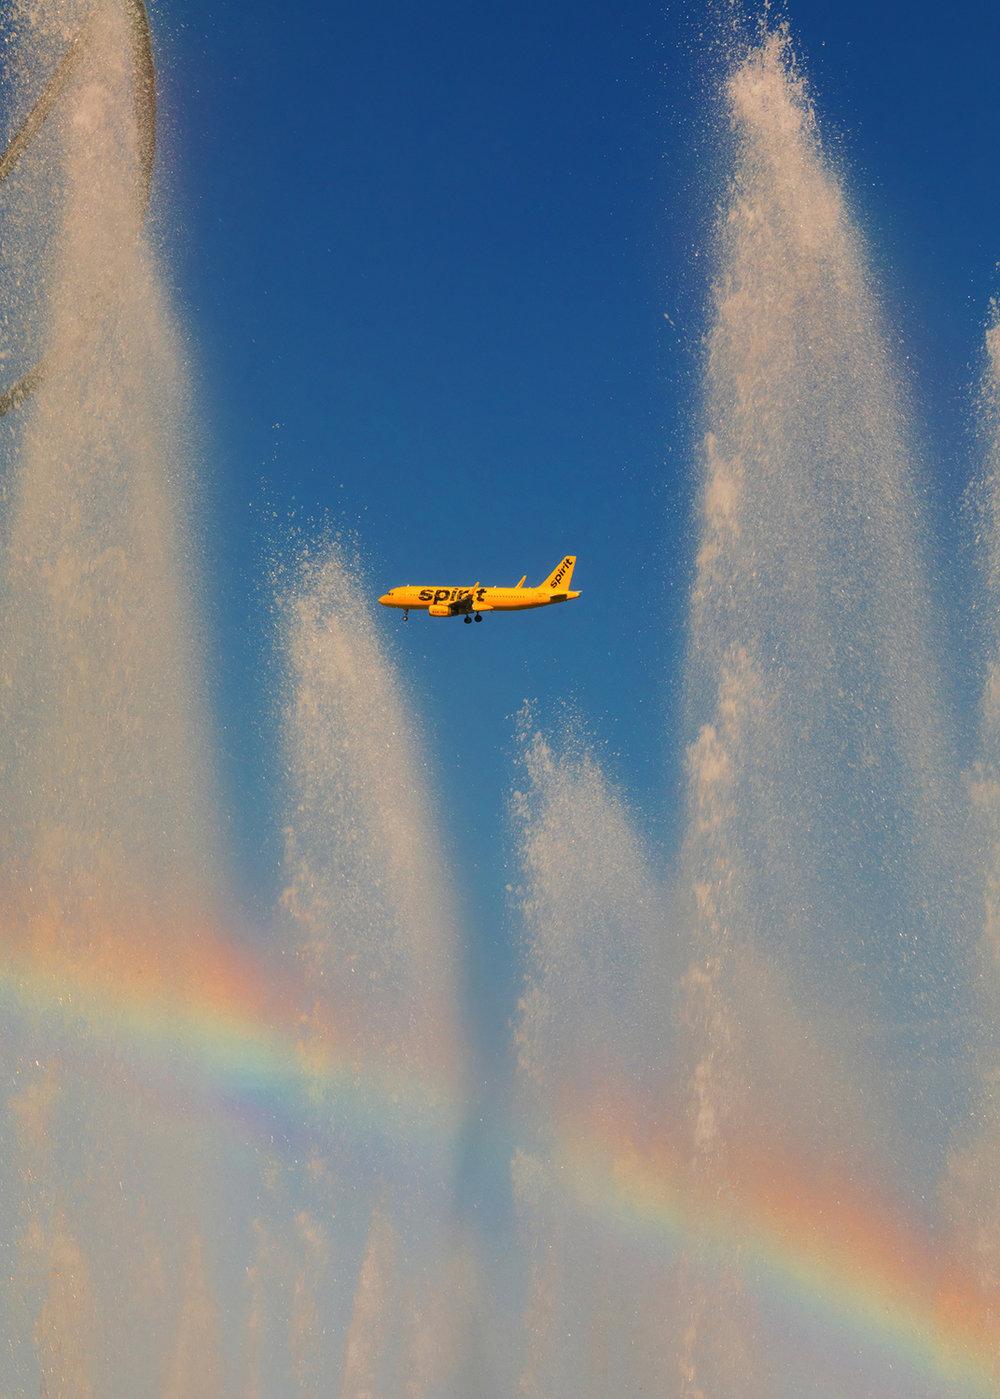 LeviMandel_Plane.jpg